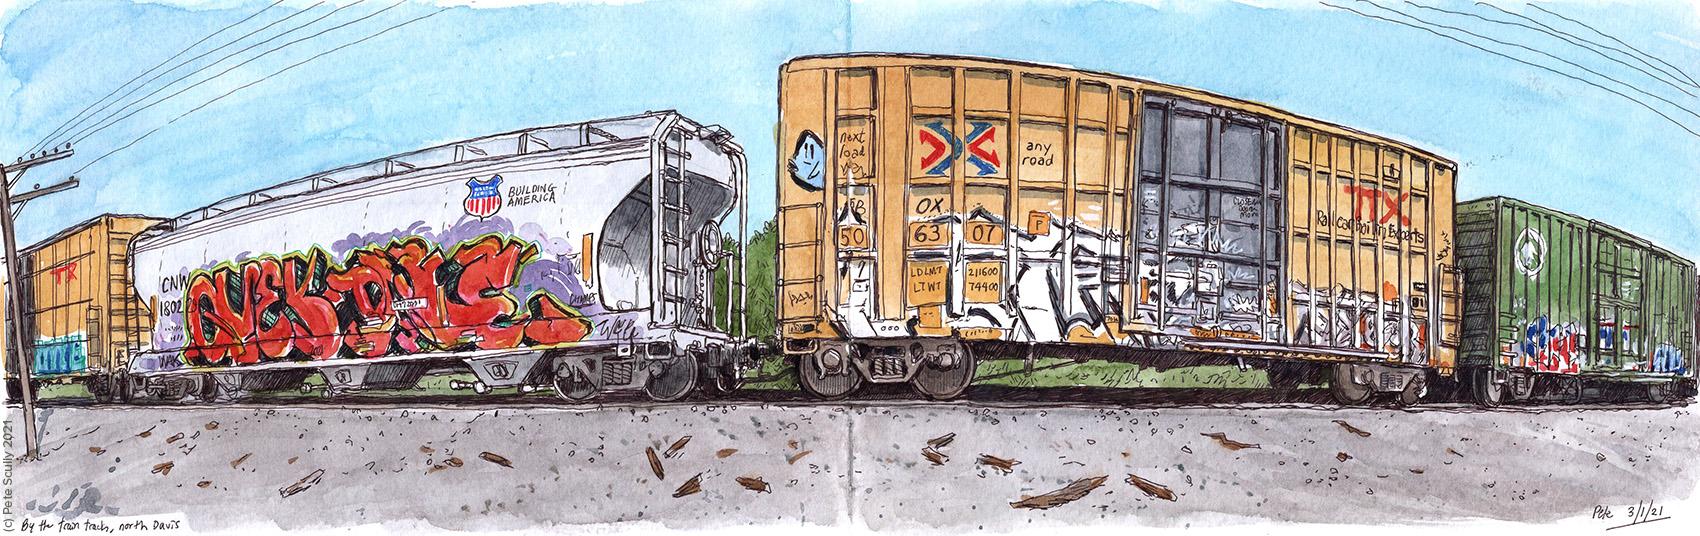 030121 train tracks sm